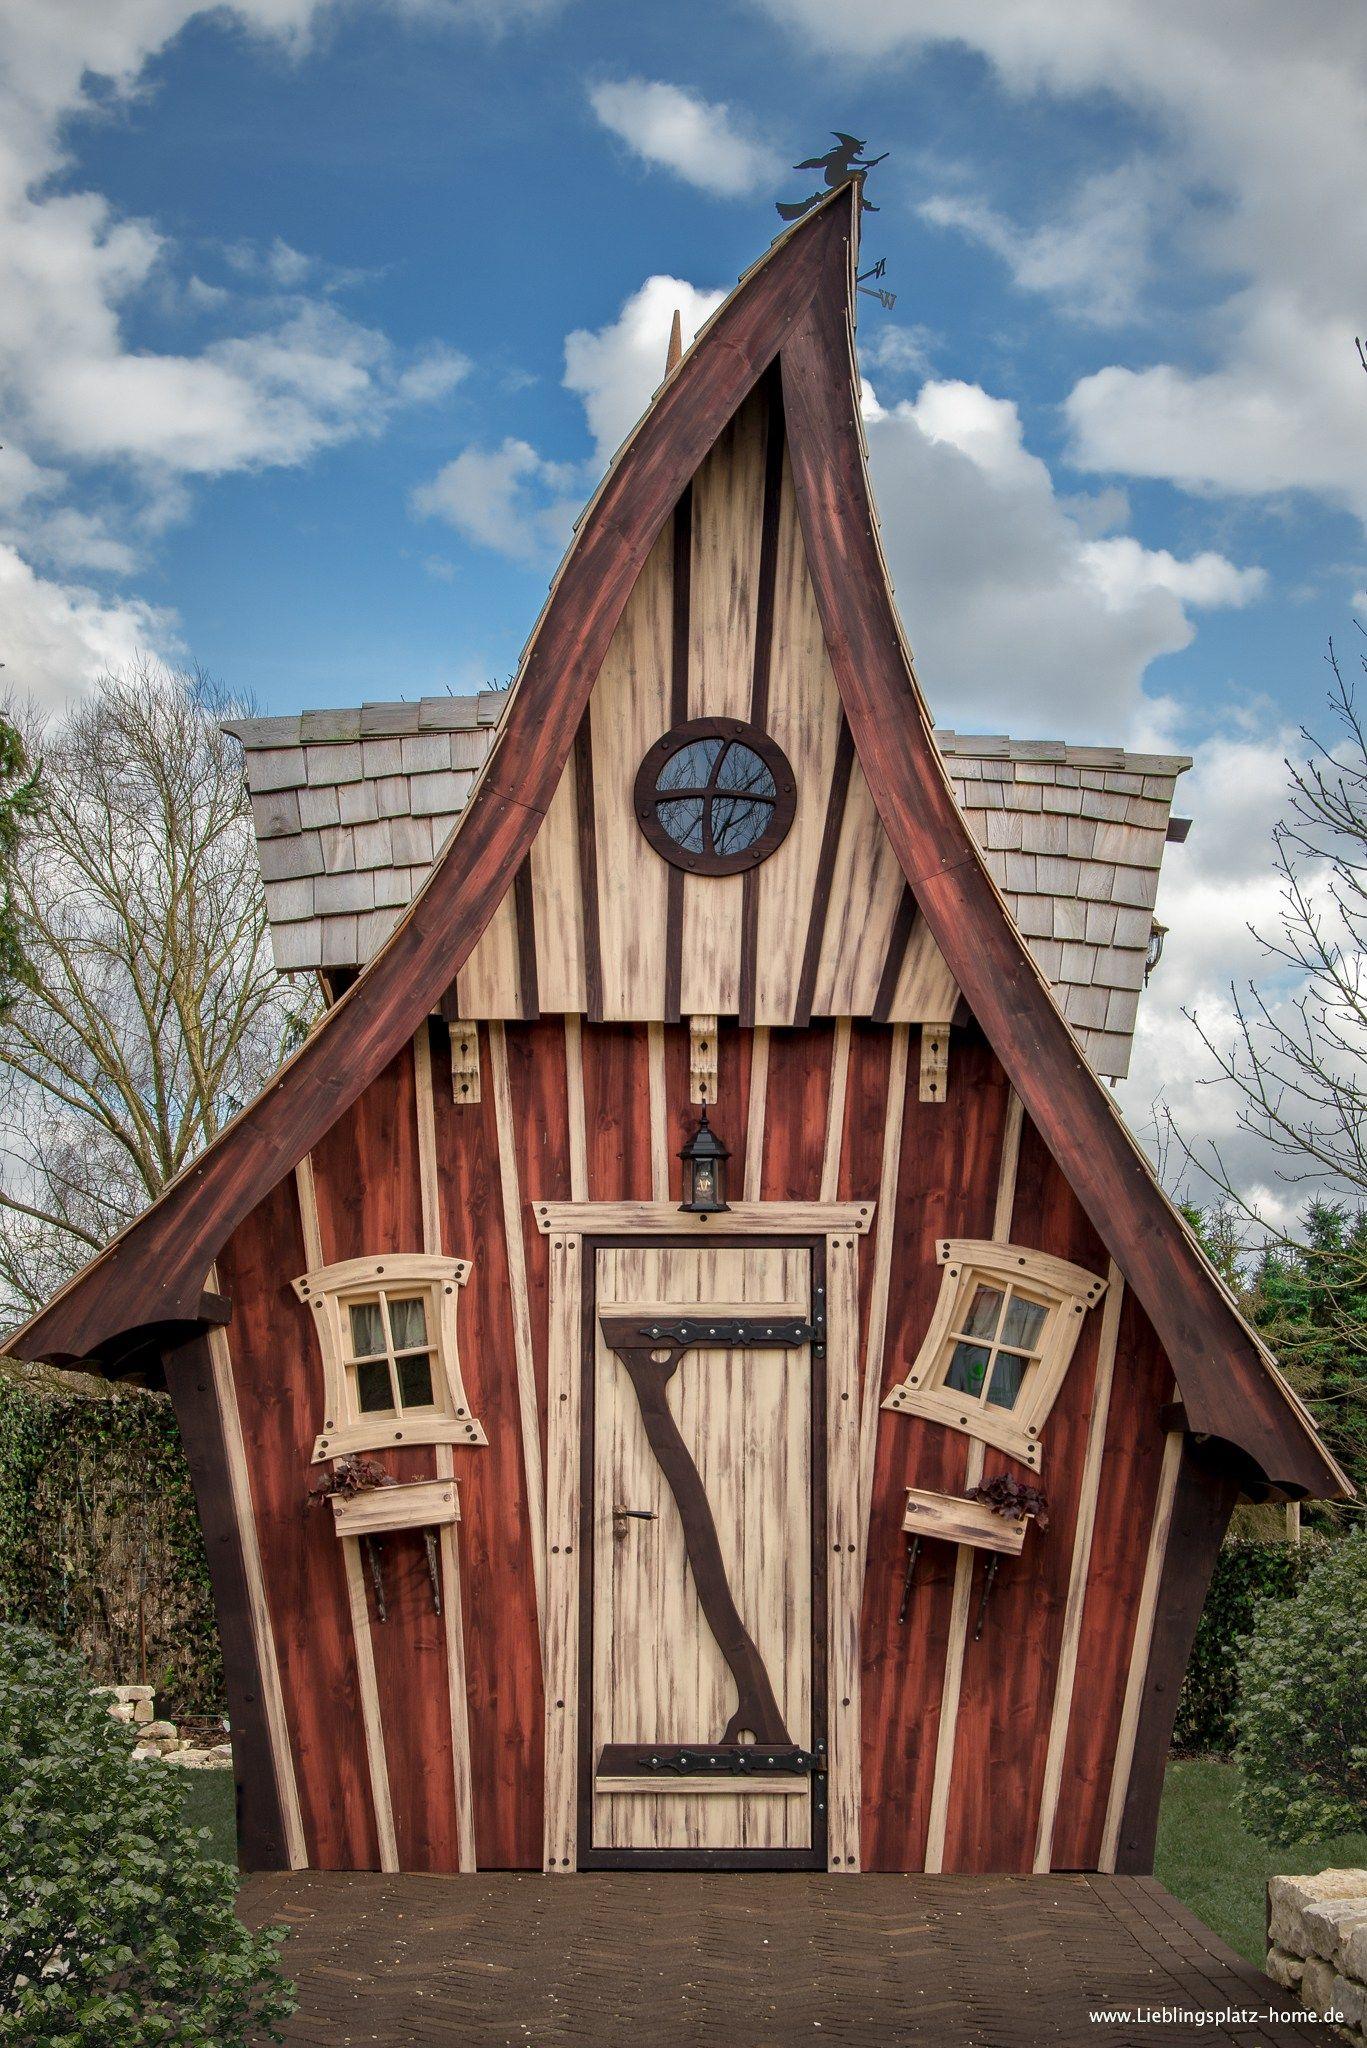 Aura XL Märchenhafte hütte, Märchenhaus, Hobbithaus